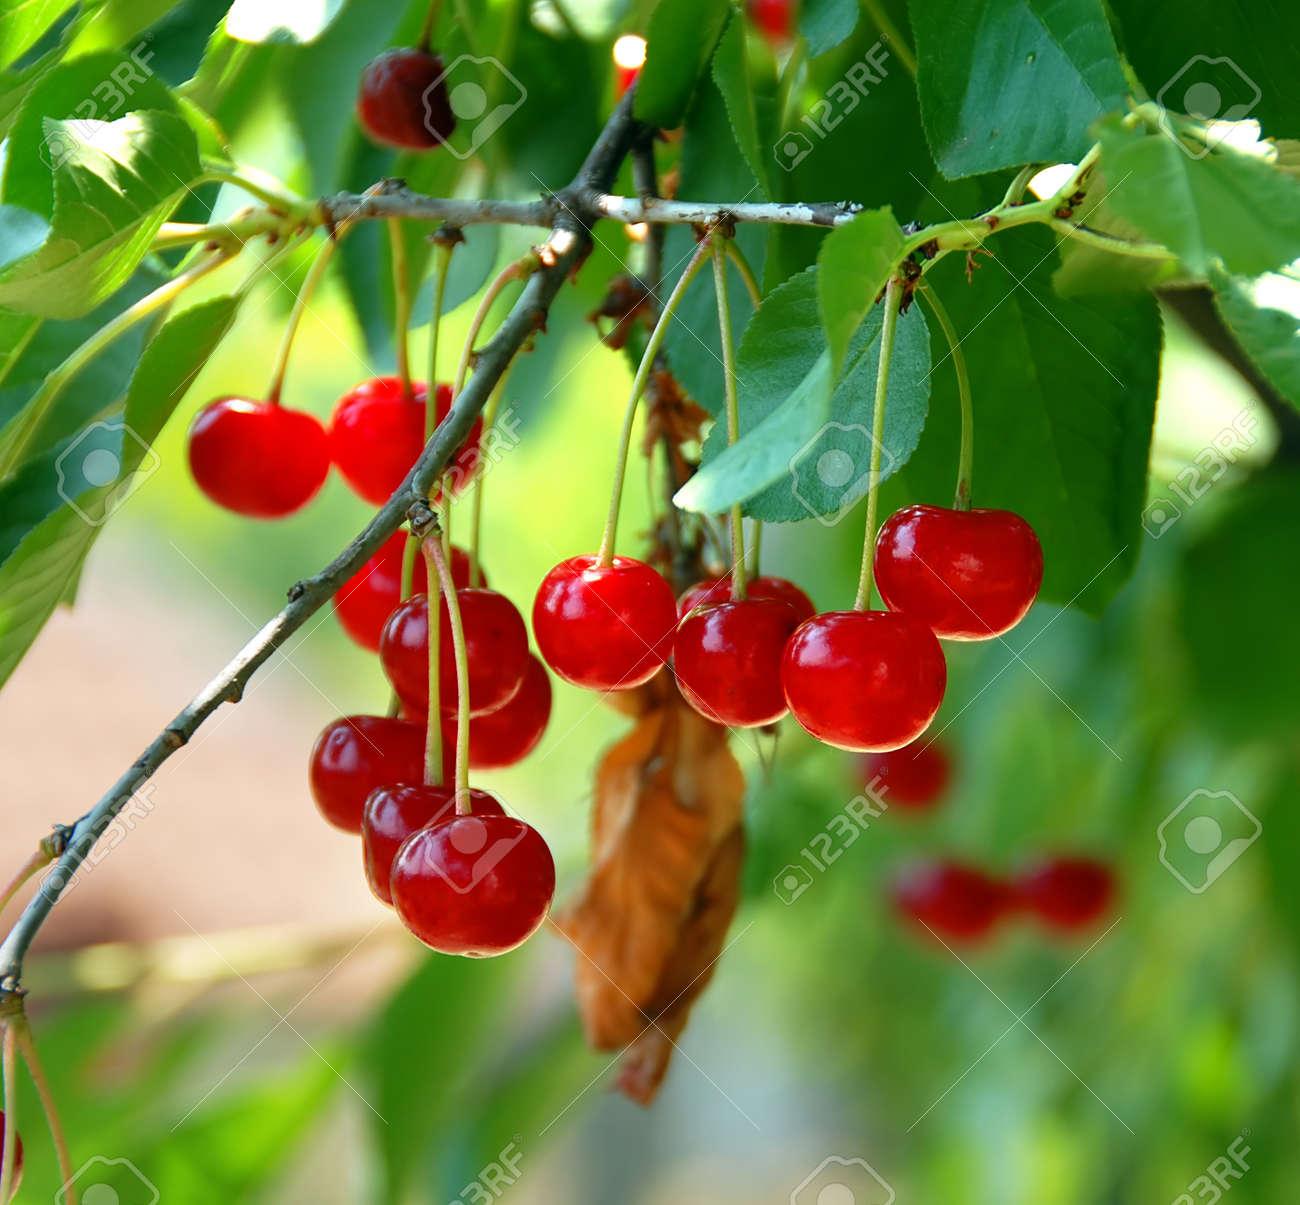 group of red cherries growing on tree closeup - 10323340